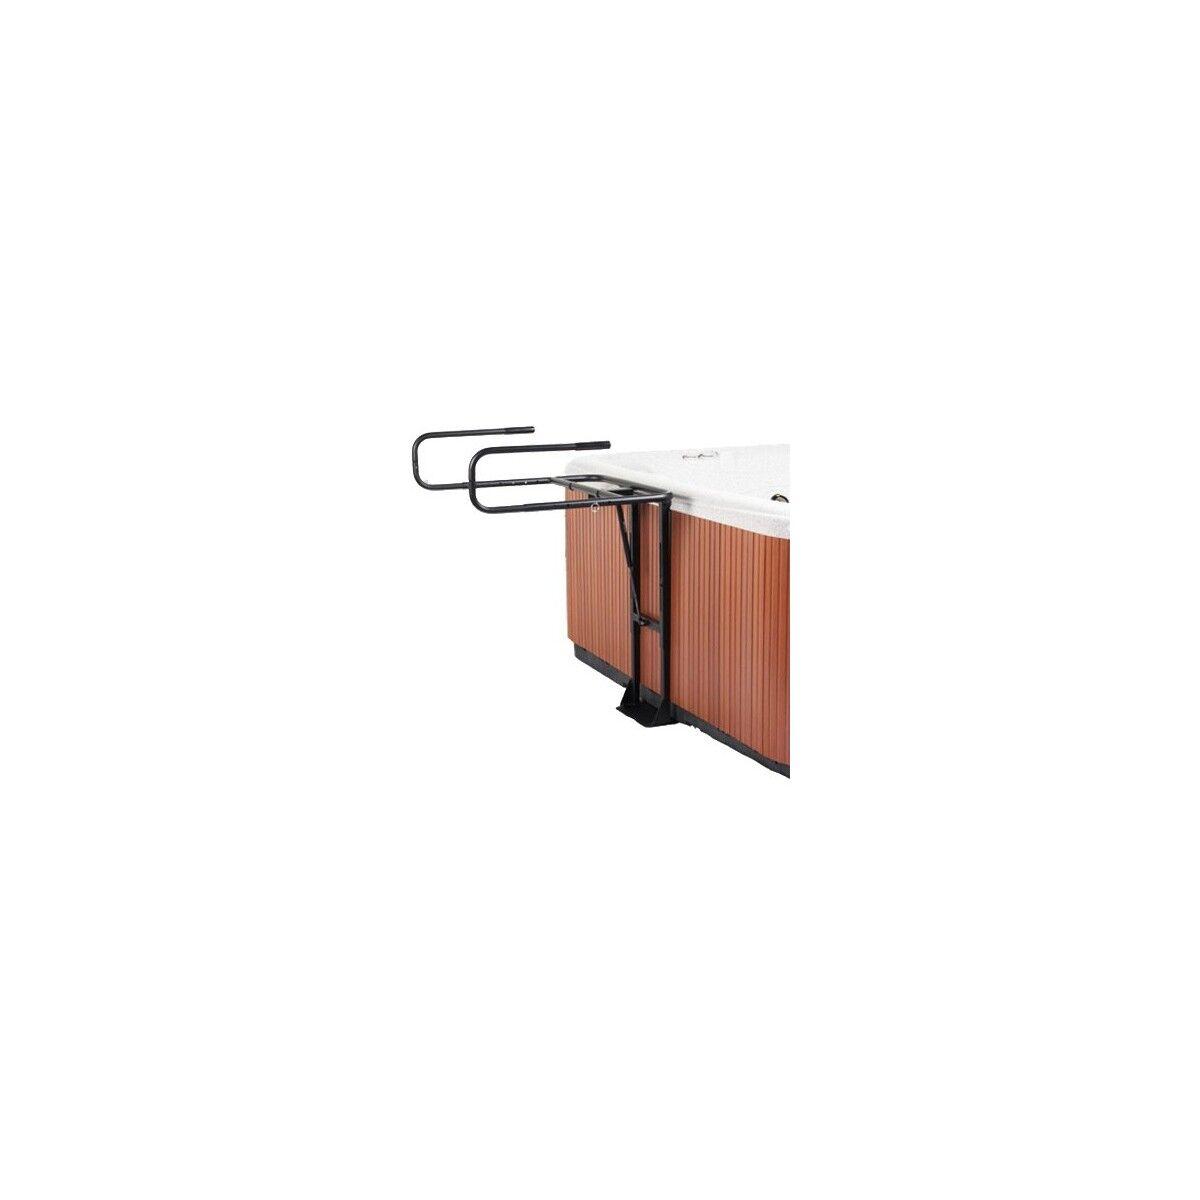 Spatec Jacuzzi Accessori Sollevatore copertura pneumatico